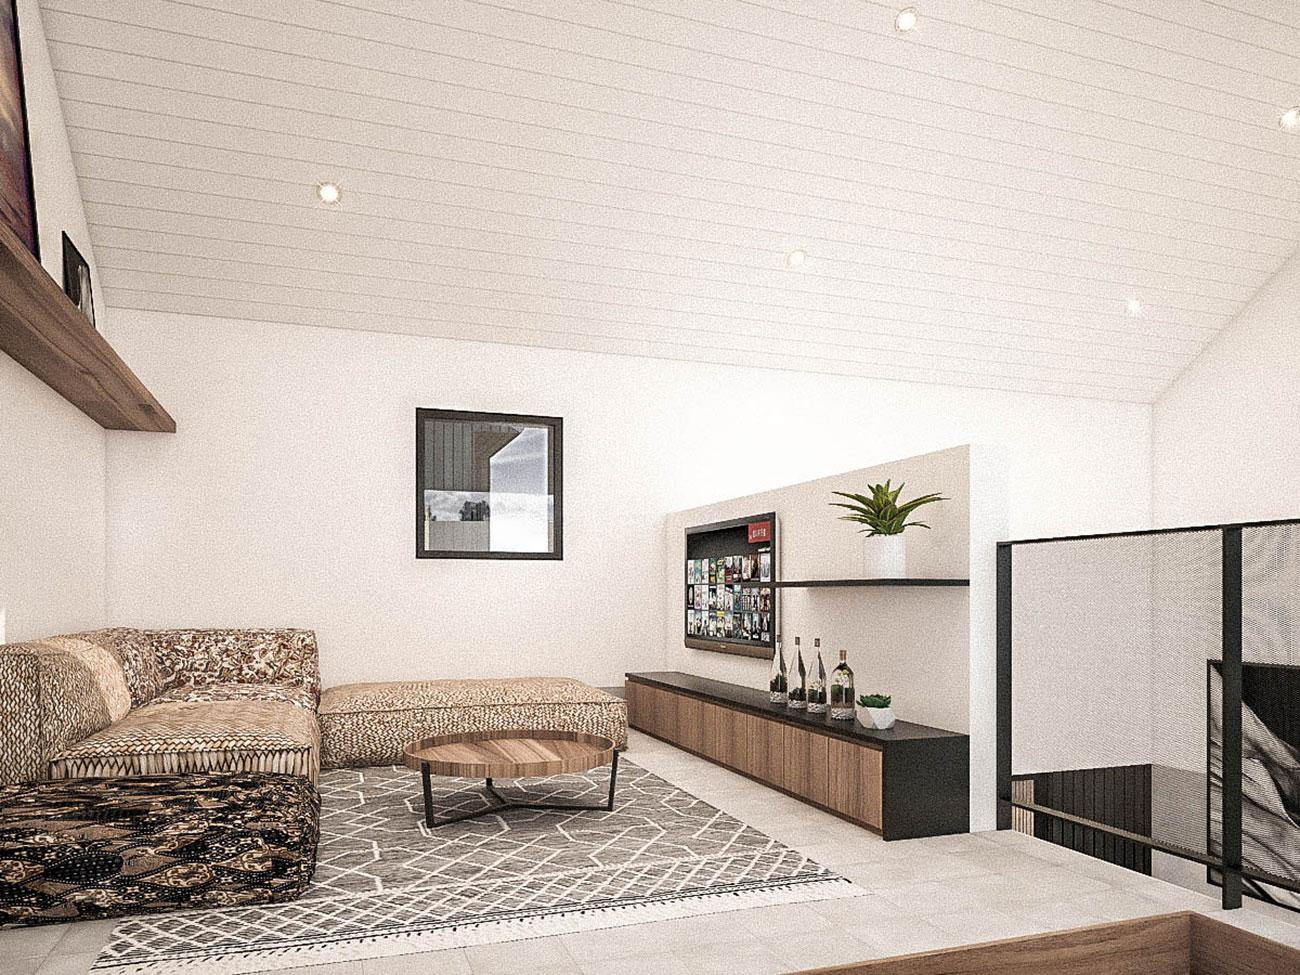 House-A-interior-1